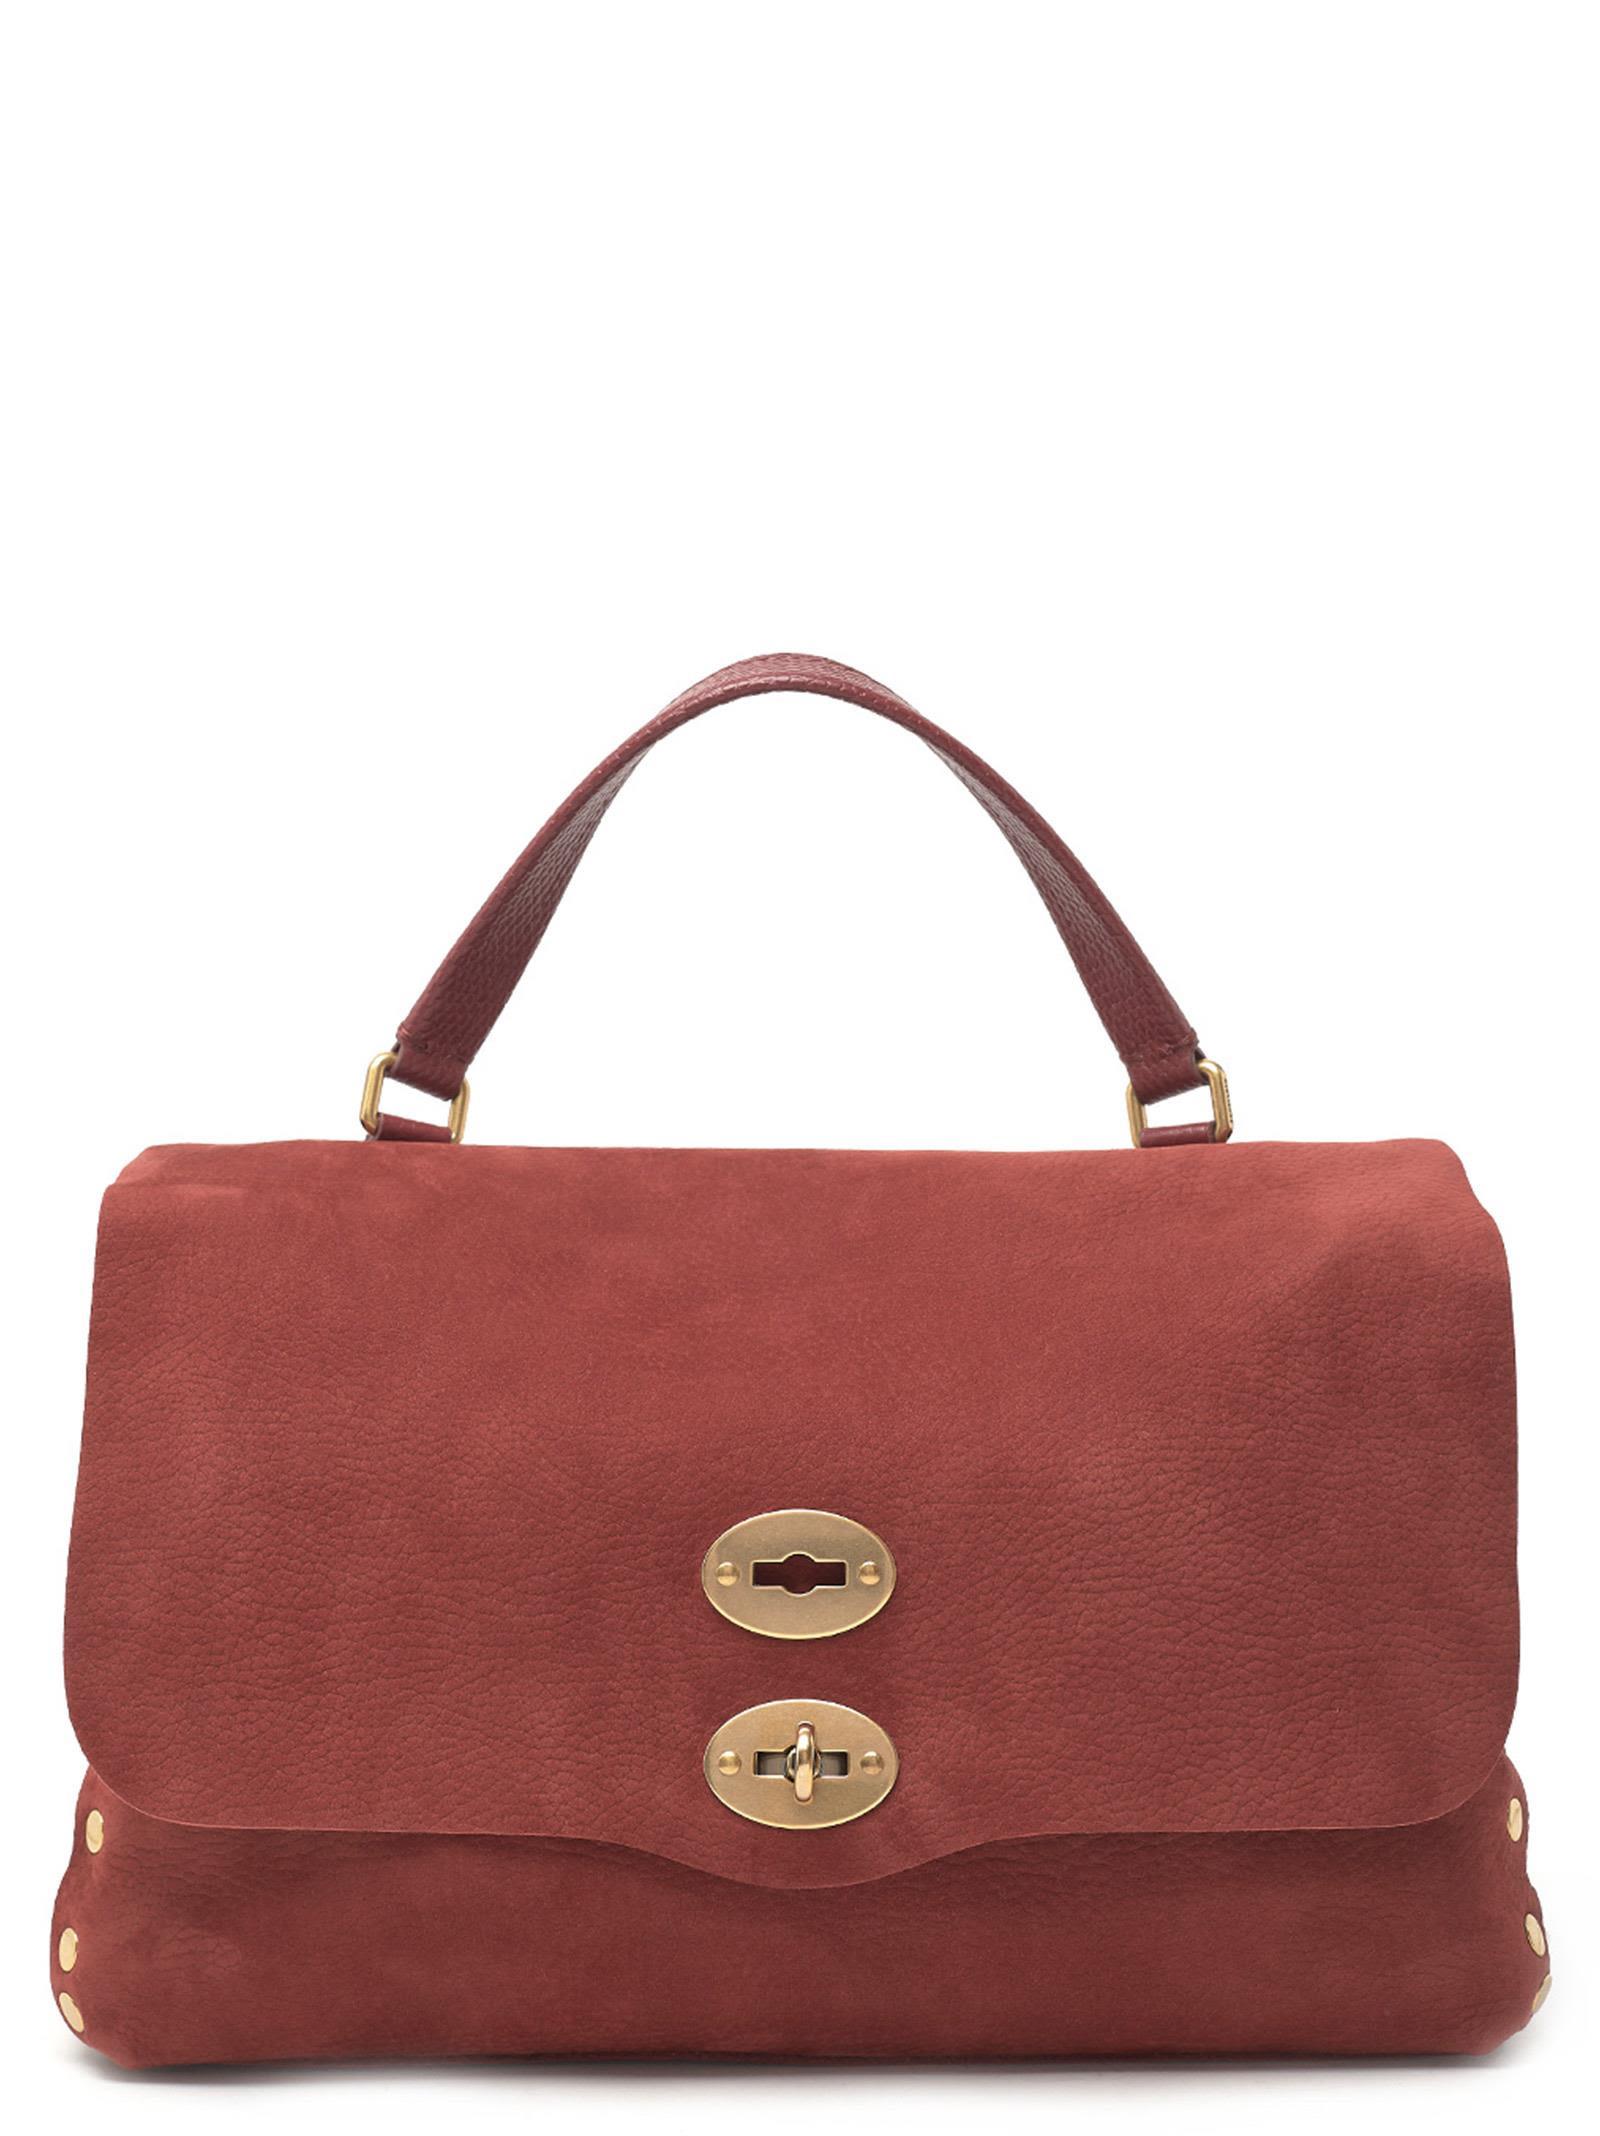 POSTINA HAND BAG